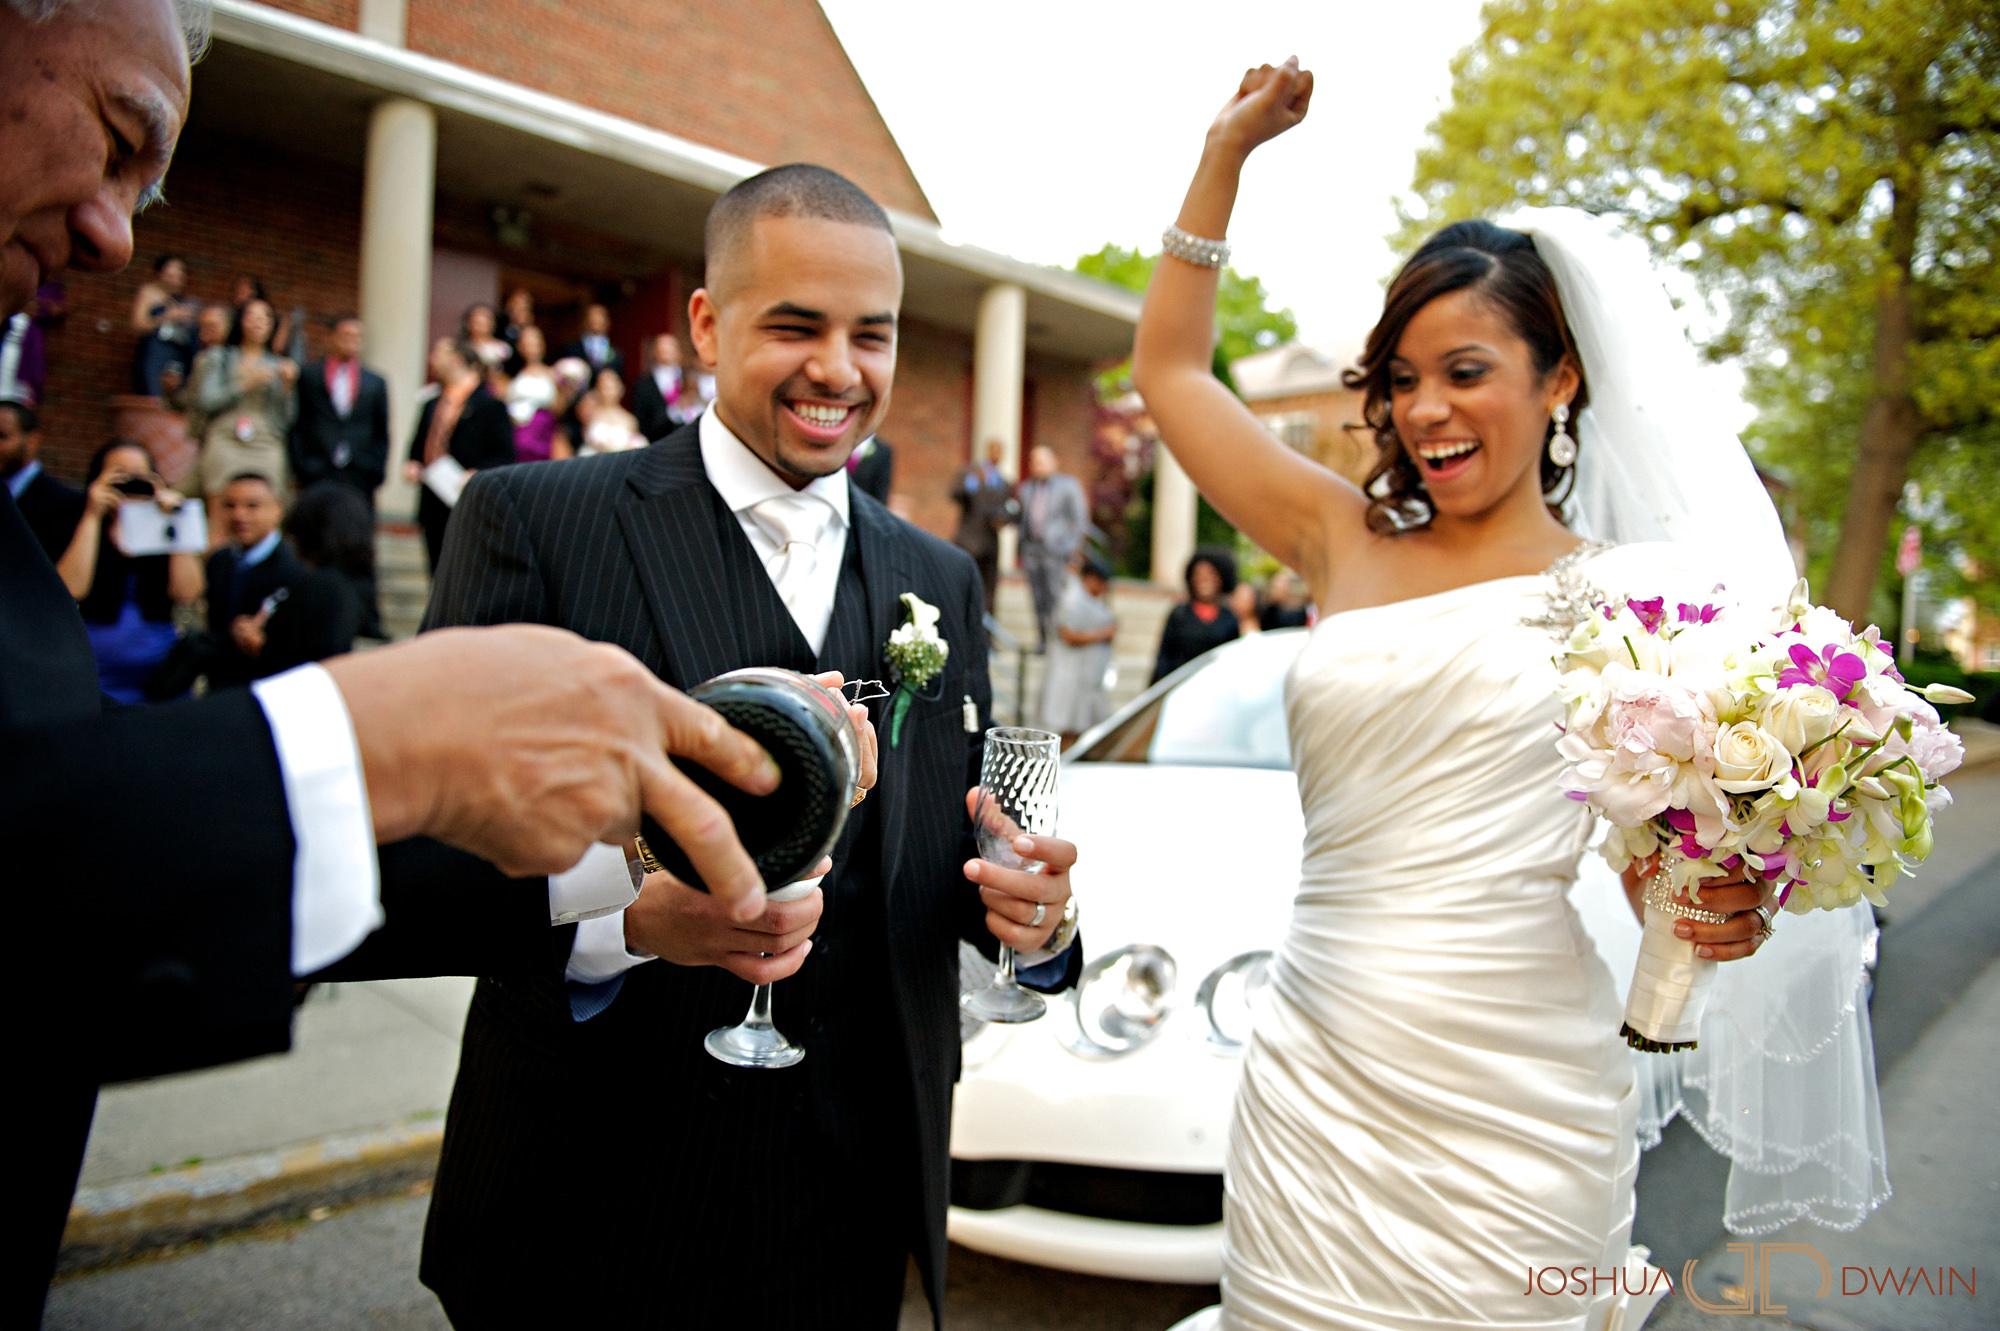 carolina-hector-025-chateau-briandlong-island-new-york-wedding-photographer-joshua-dwain-2011-05-13_ch_0663